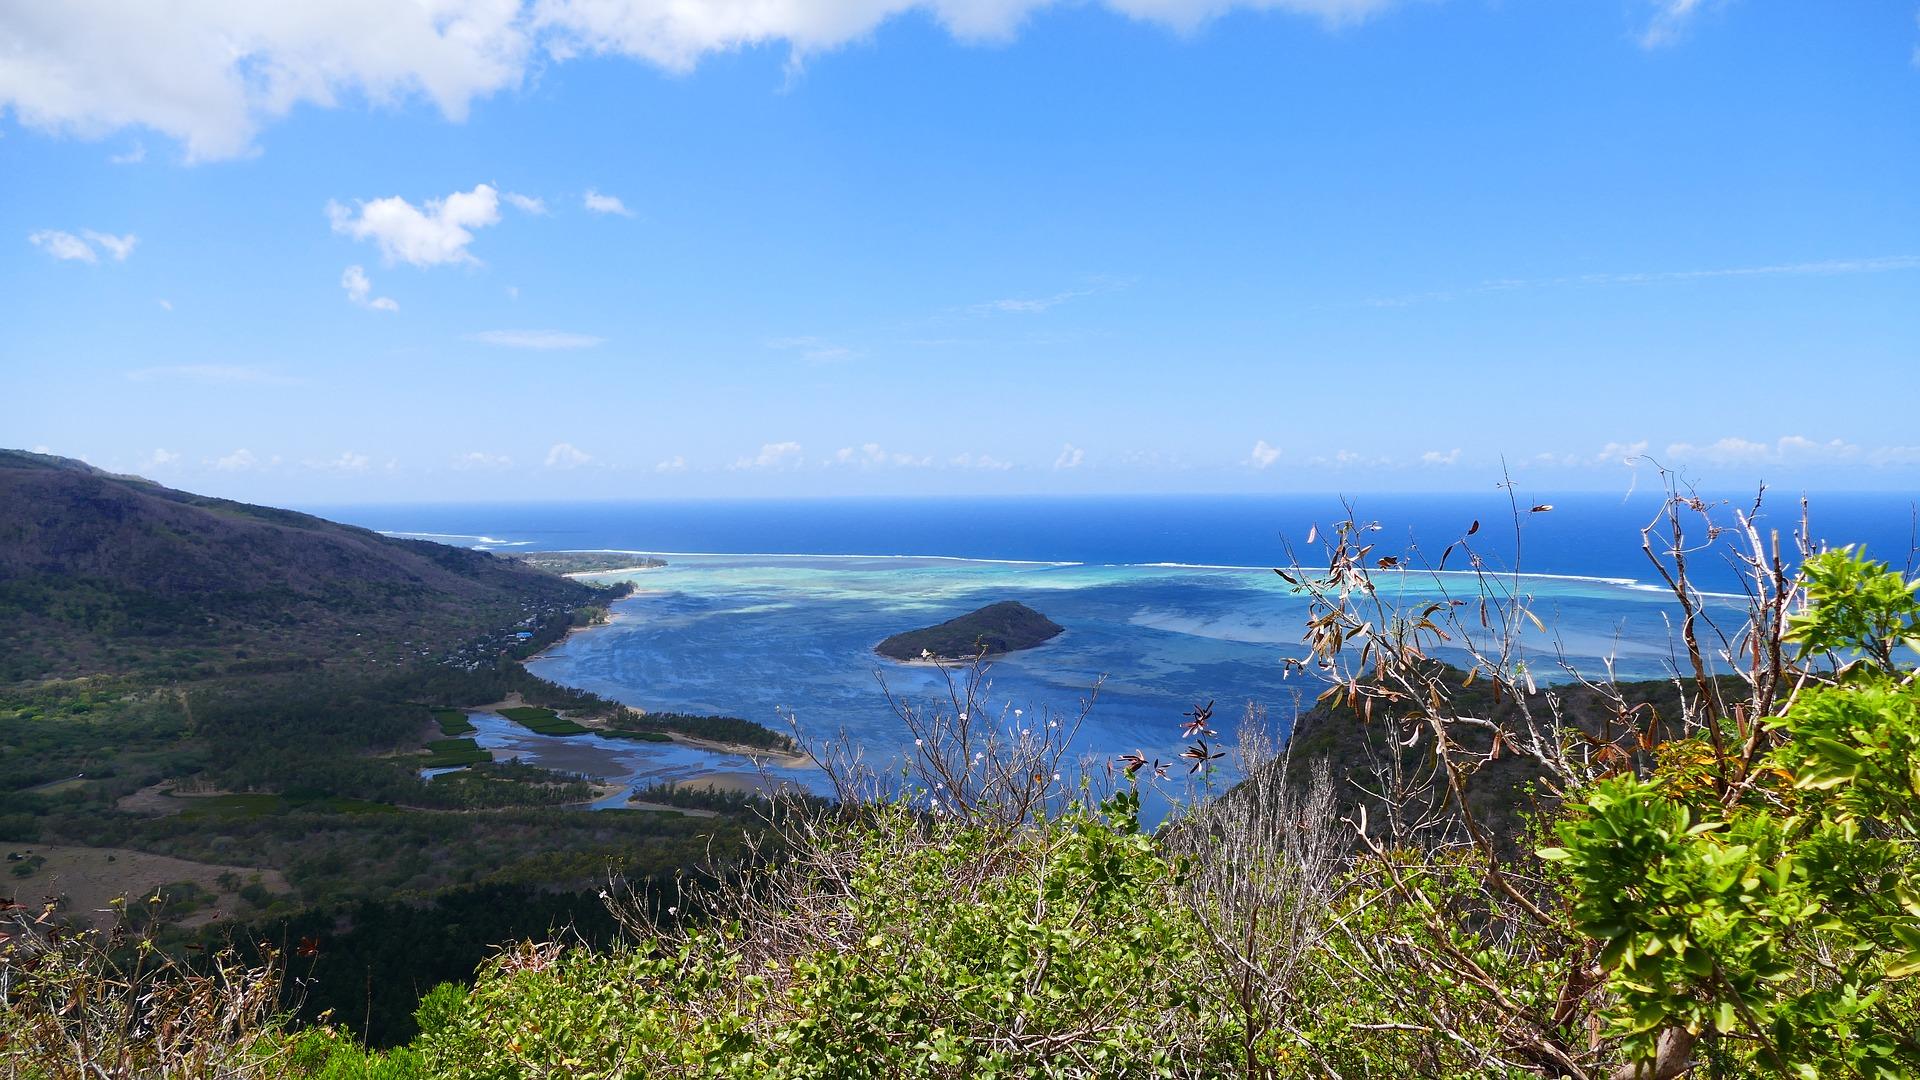 cascata sottomarina di mauritius